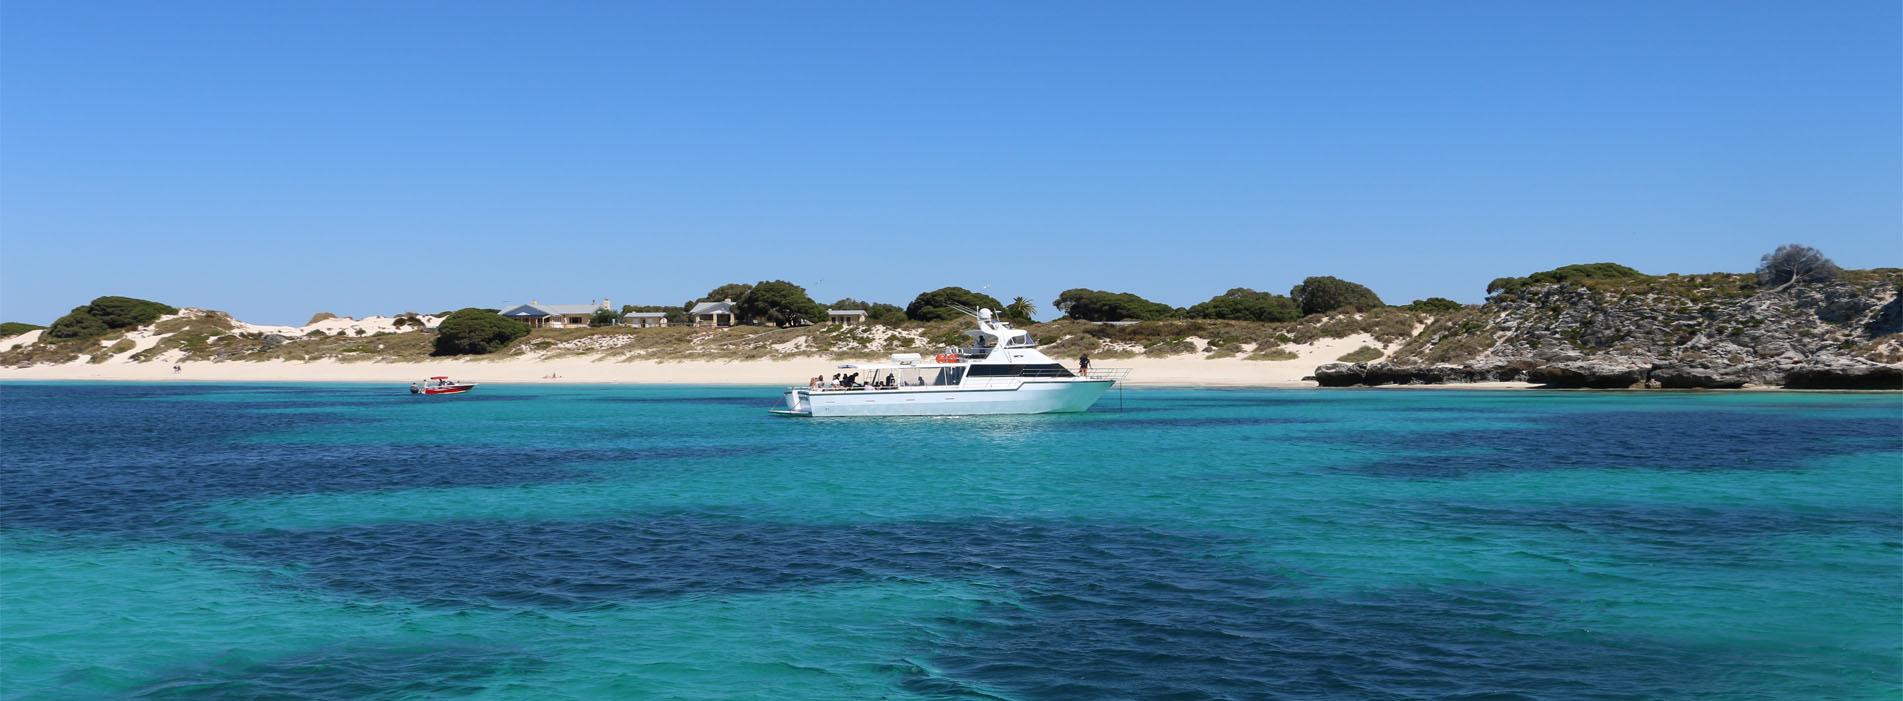 OVERNIGHT CHARTERS Rottnest Island Thomson Bay